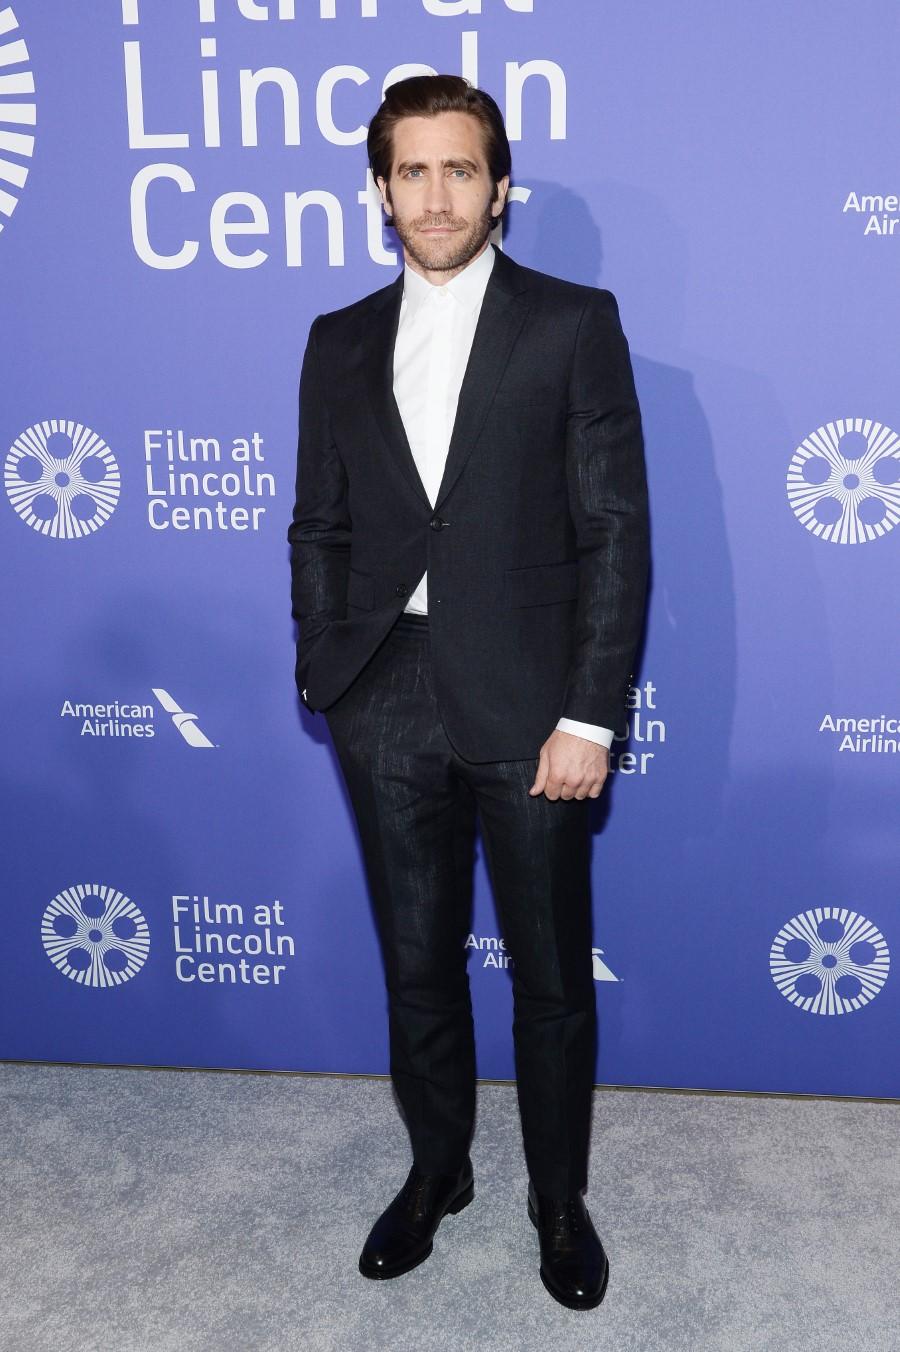 Burberry x Jake Gyllenhaal